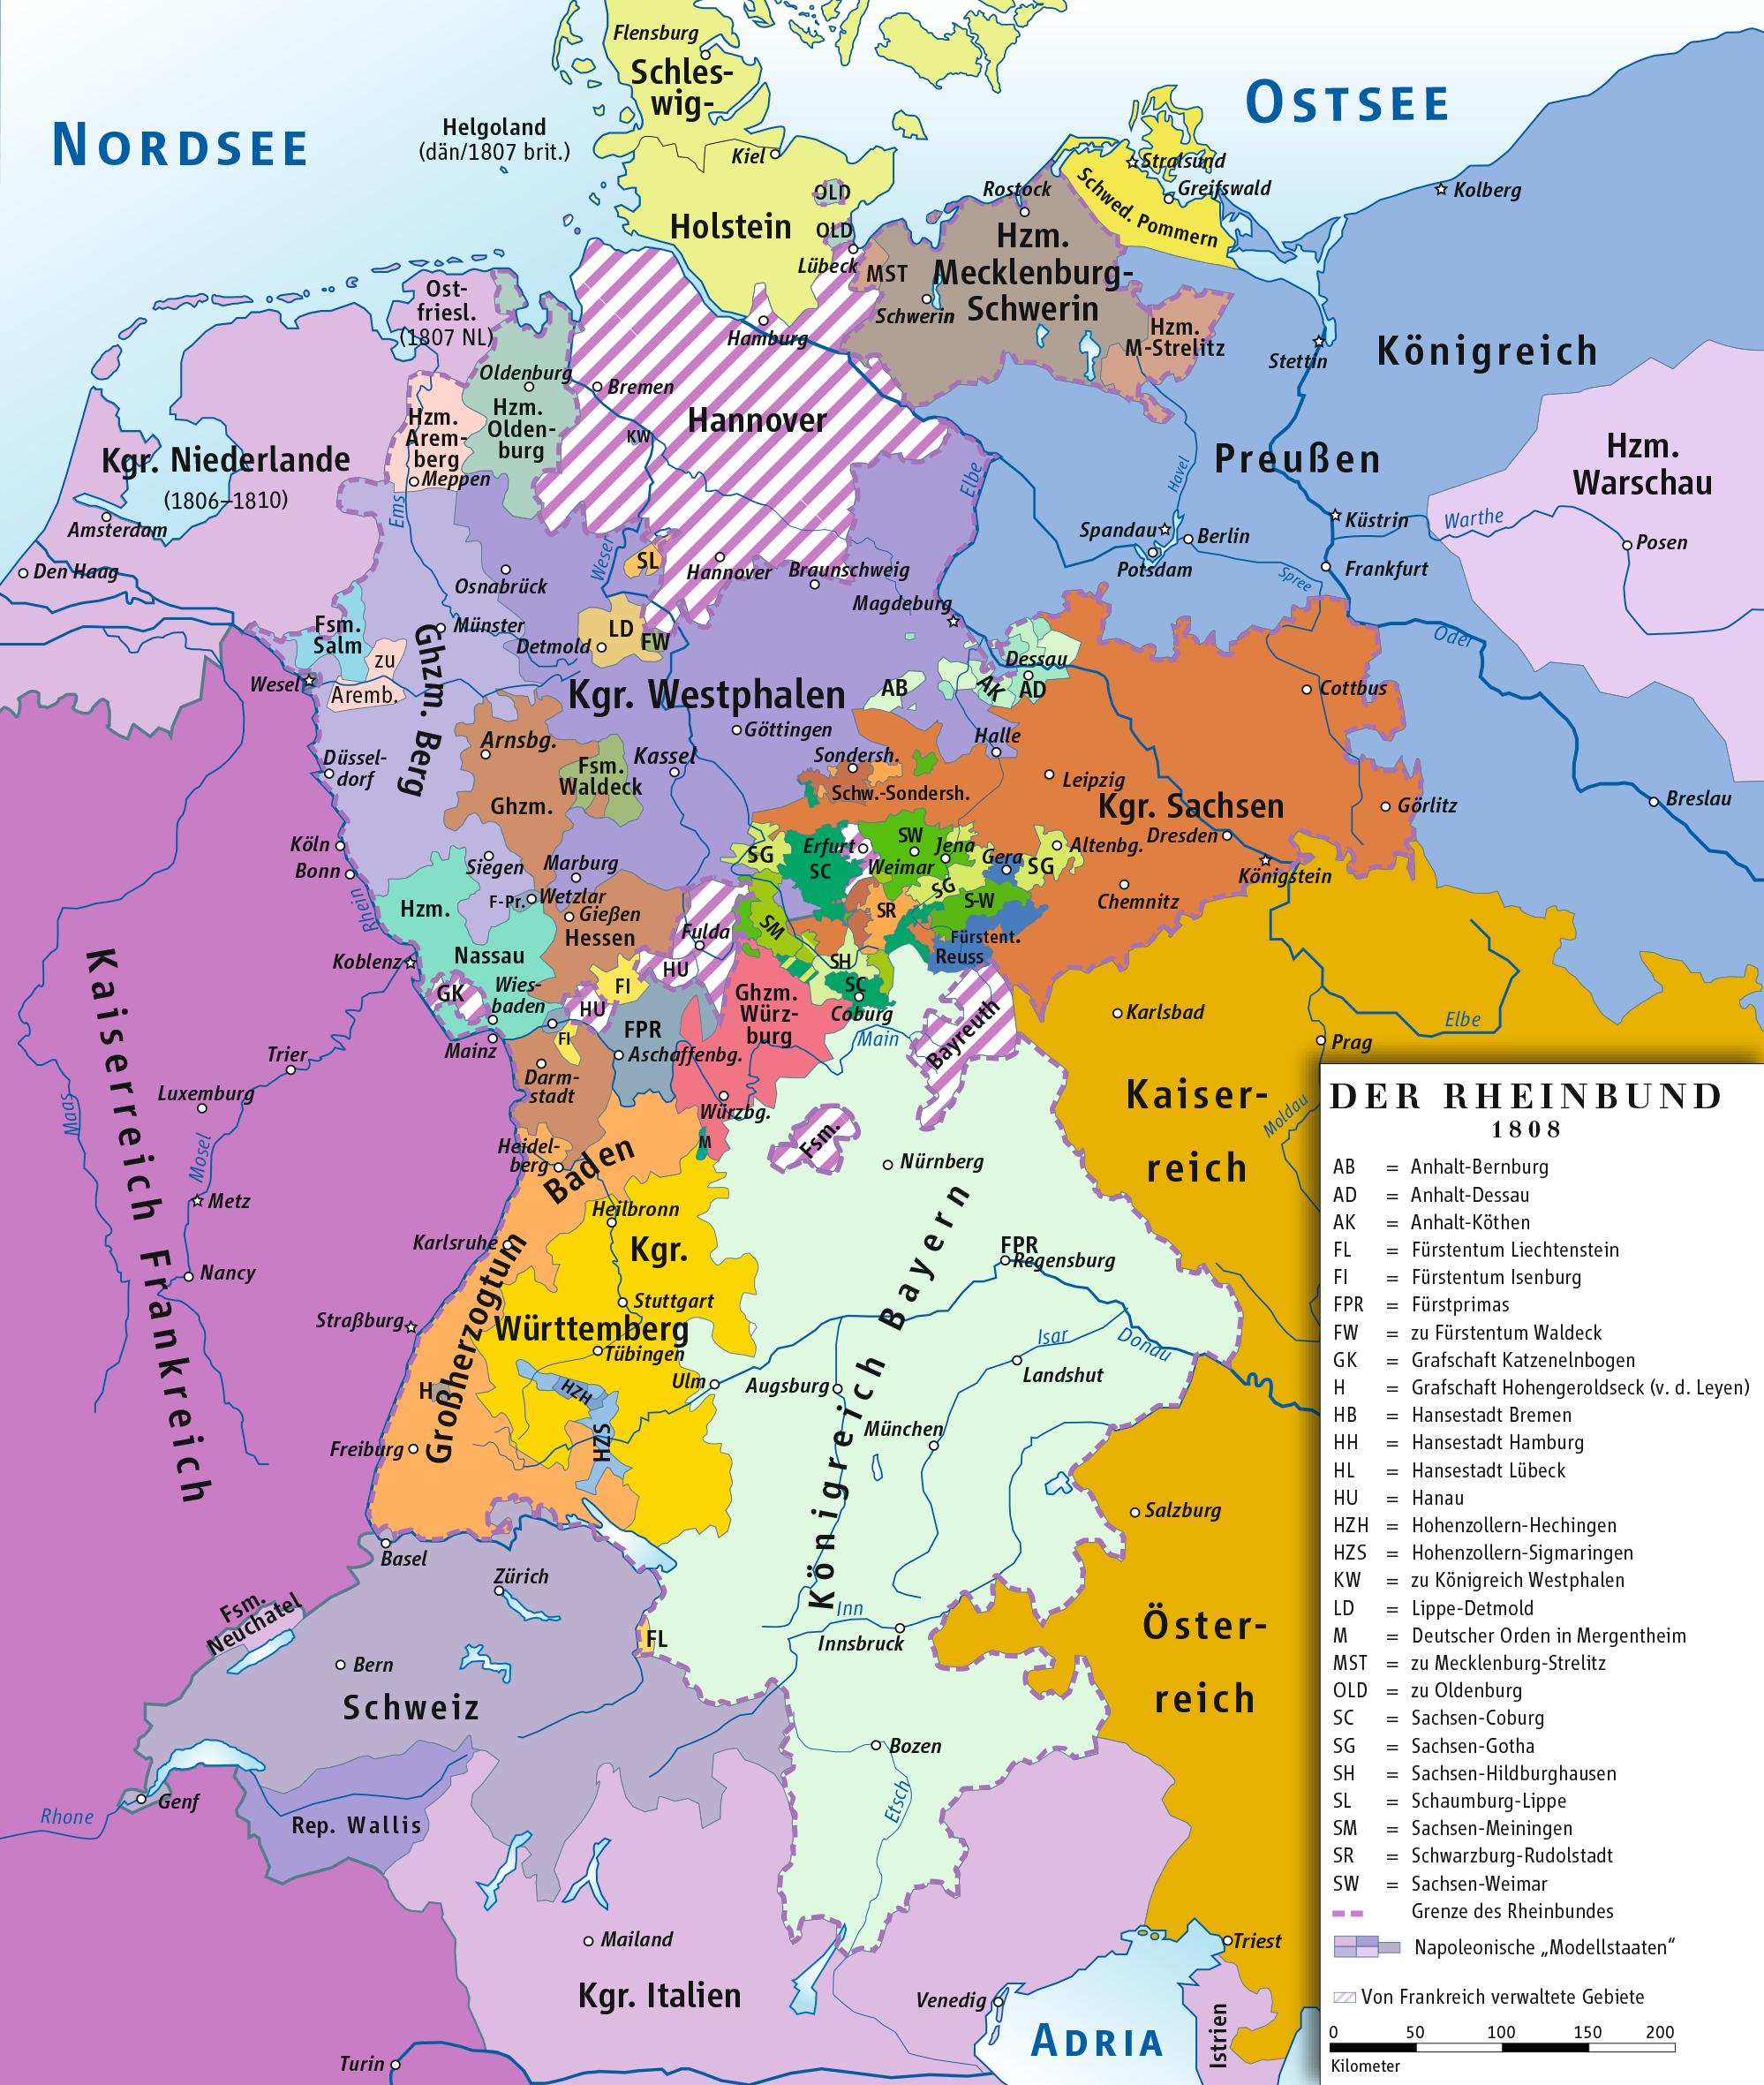 reino de baviera